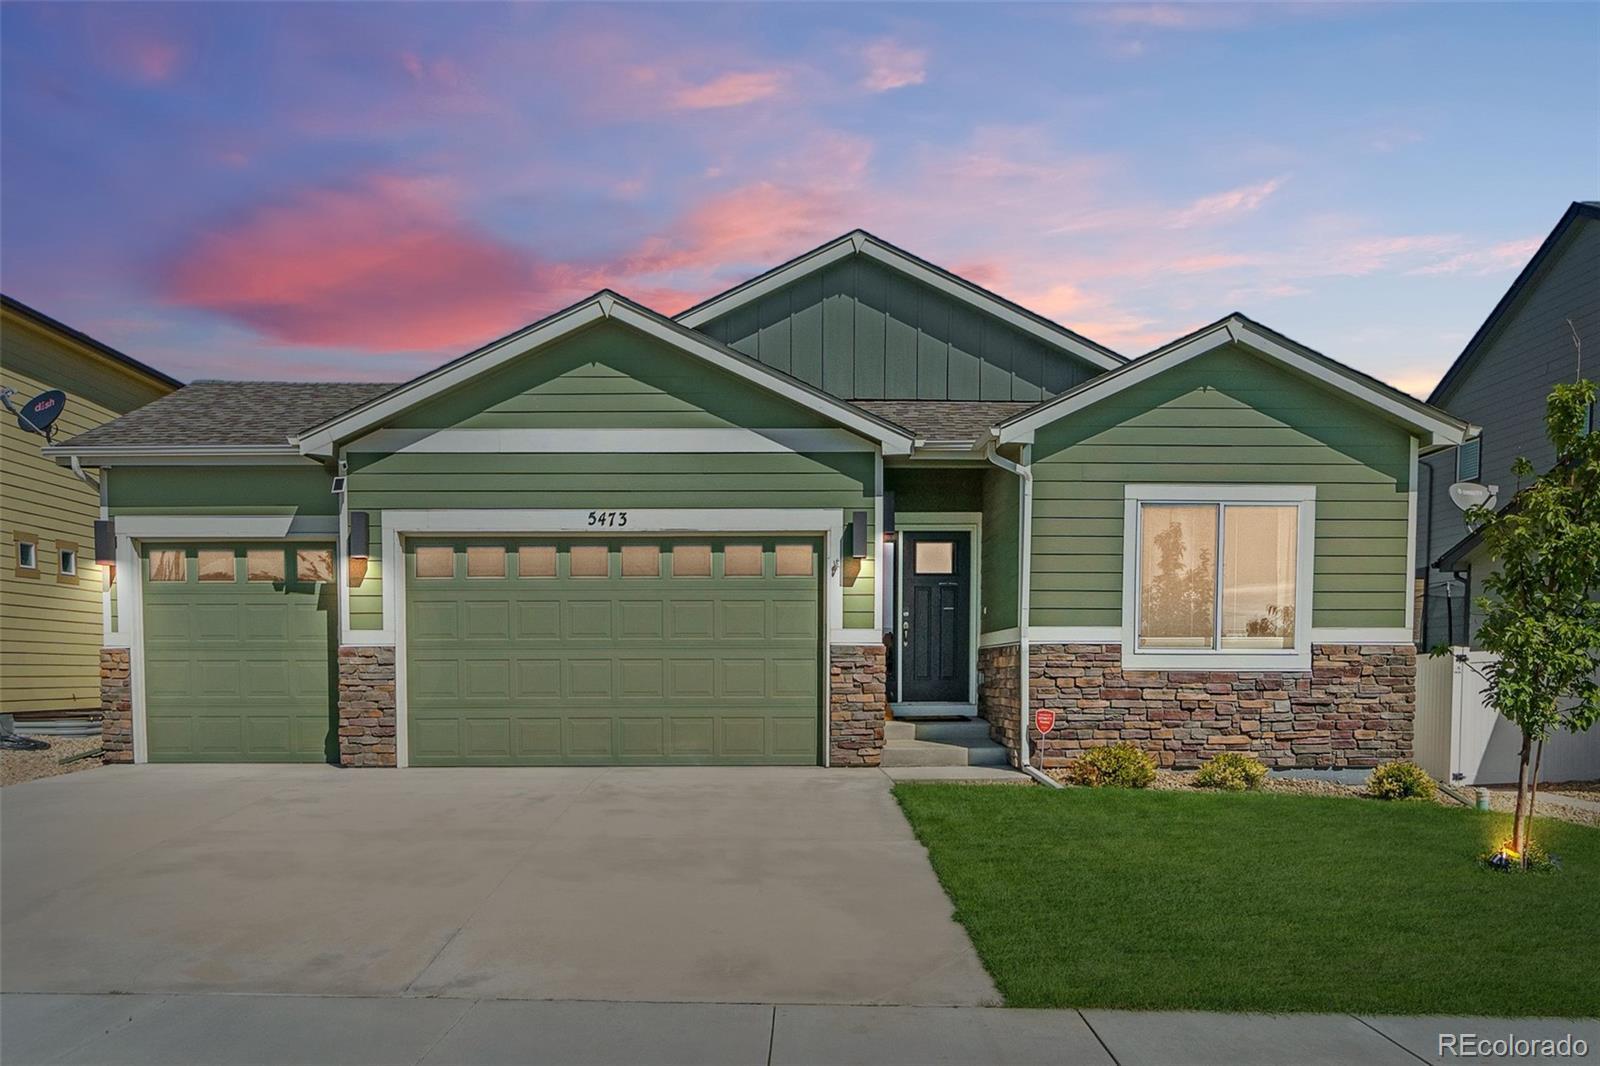 5473 Shoshone, Frederick, CO